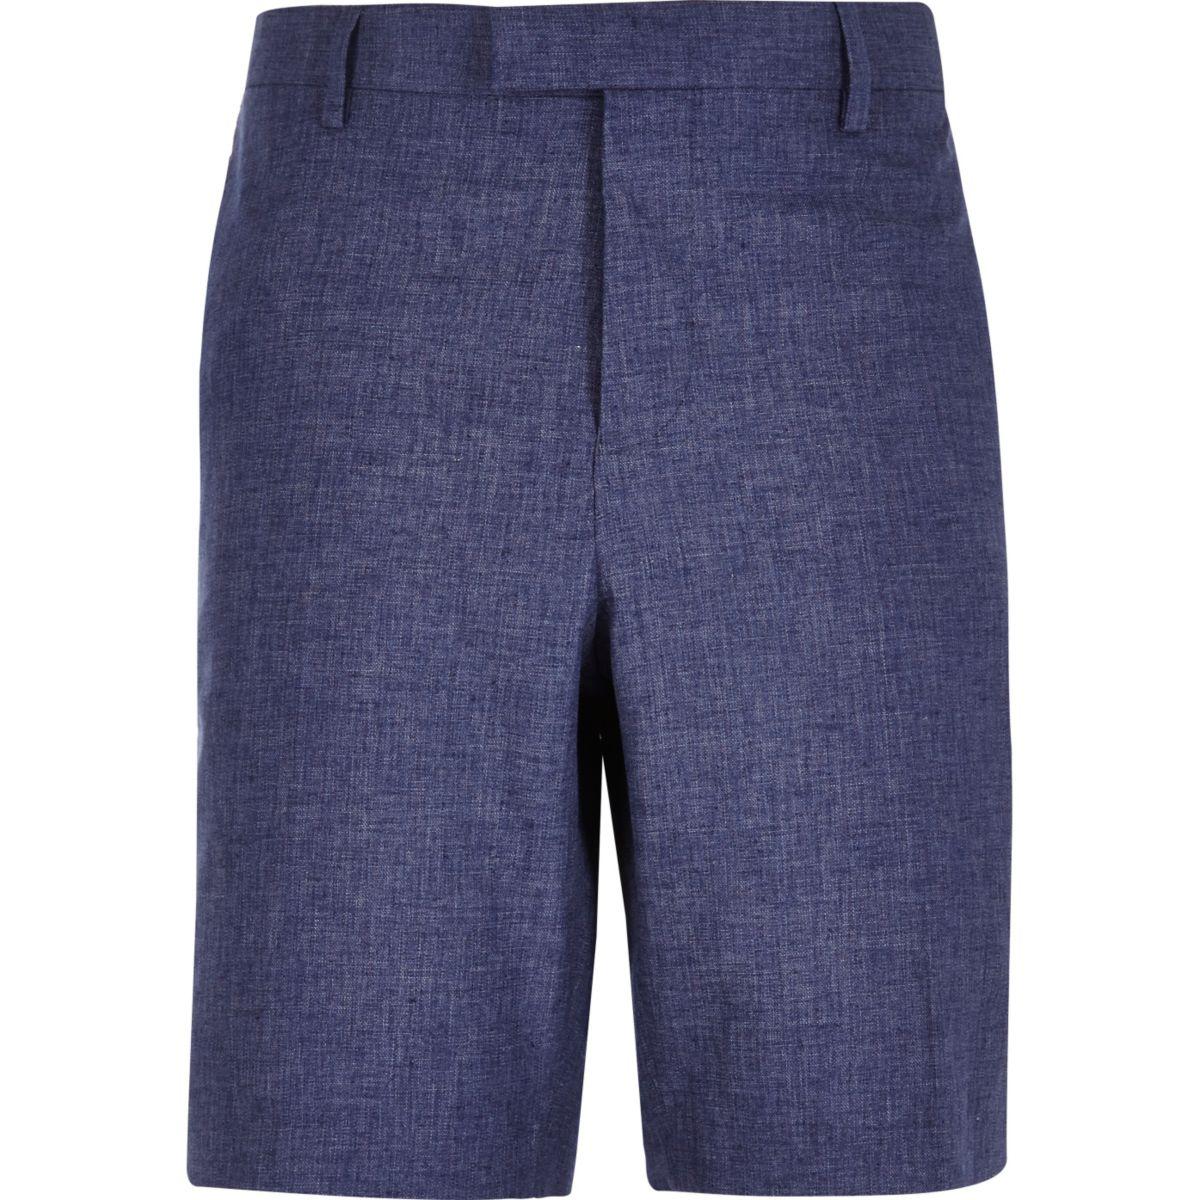 Blaue Bermuda-Shorts aus Leinen